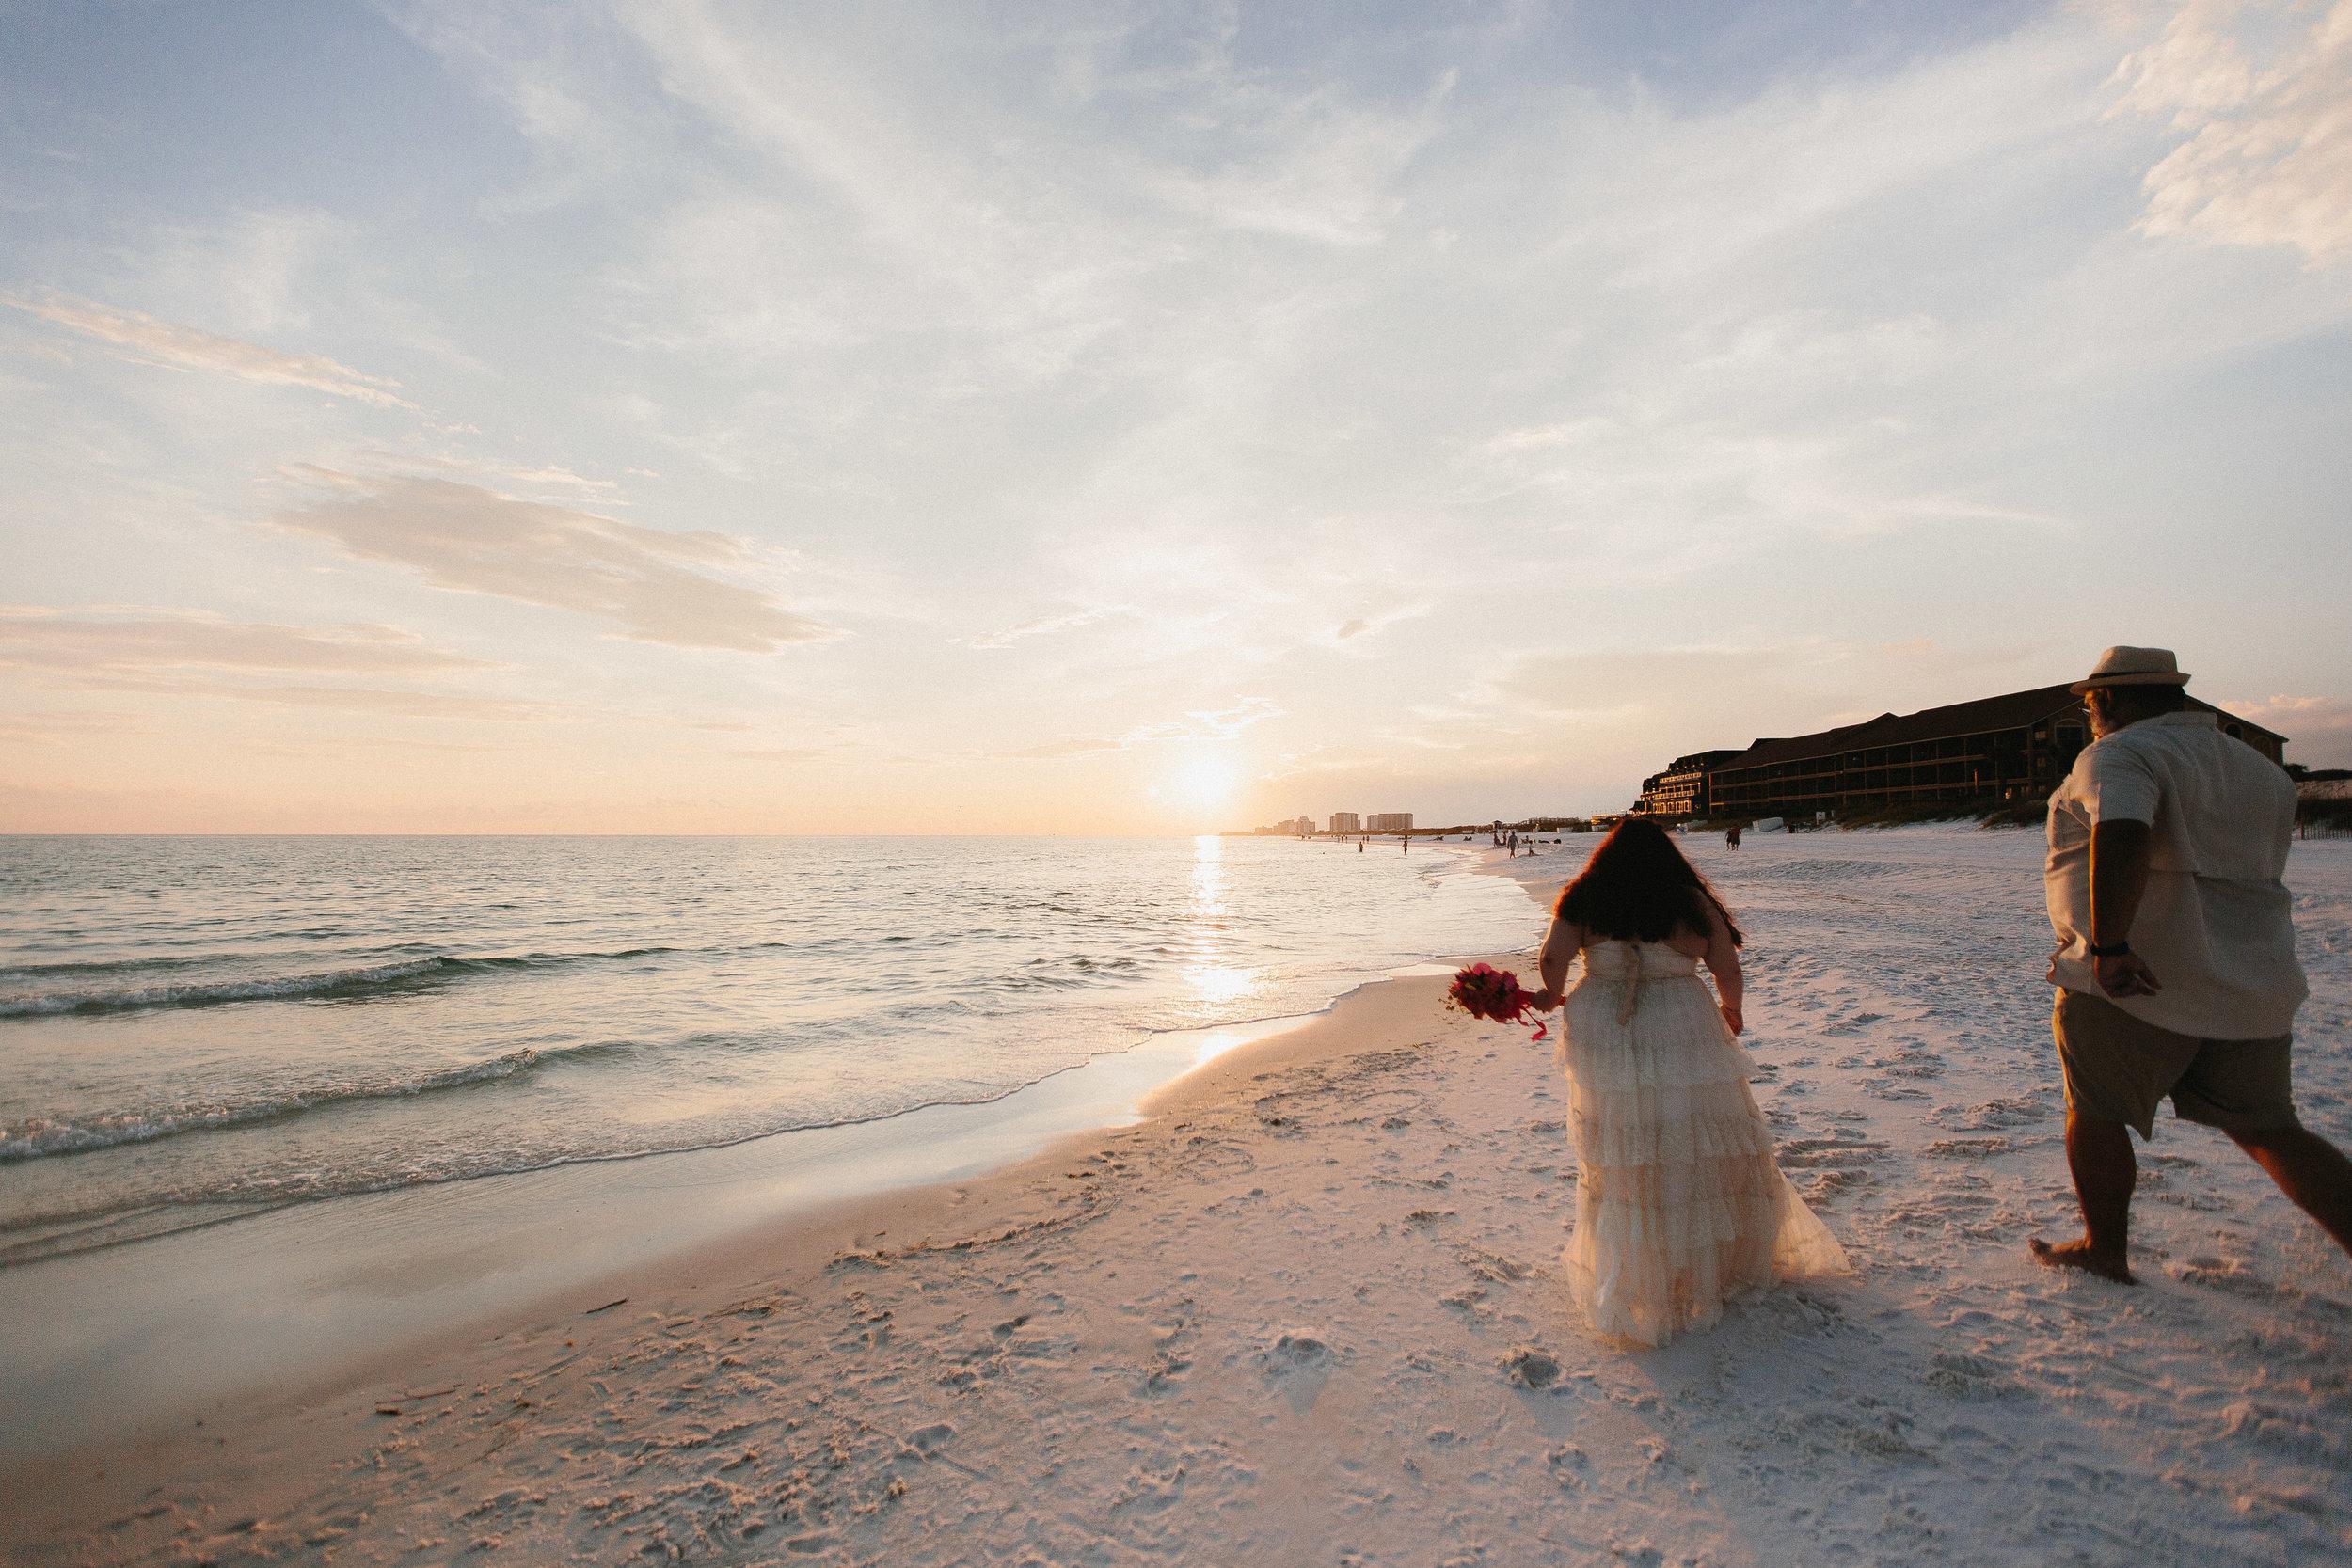 destin_sunset_beach_elopement_intimate_wedding_photographer_florida_documentary_1301.jpg